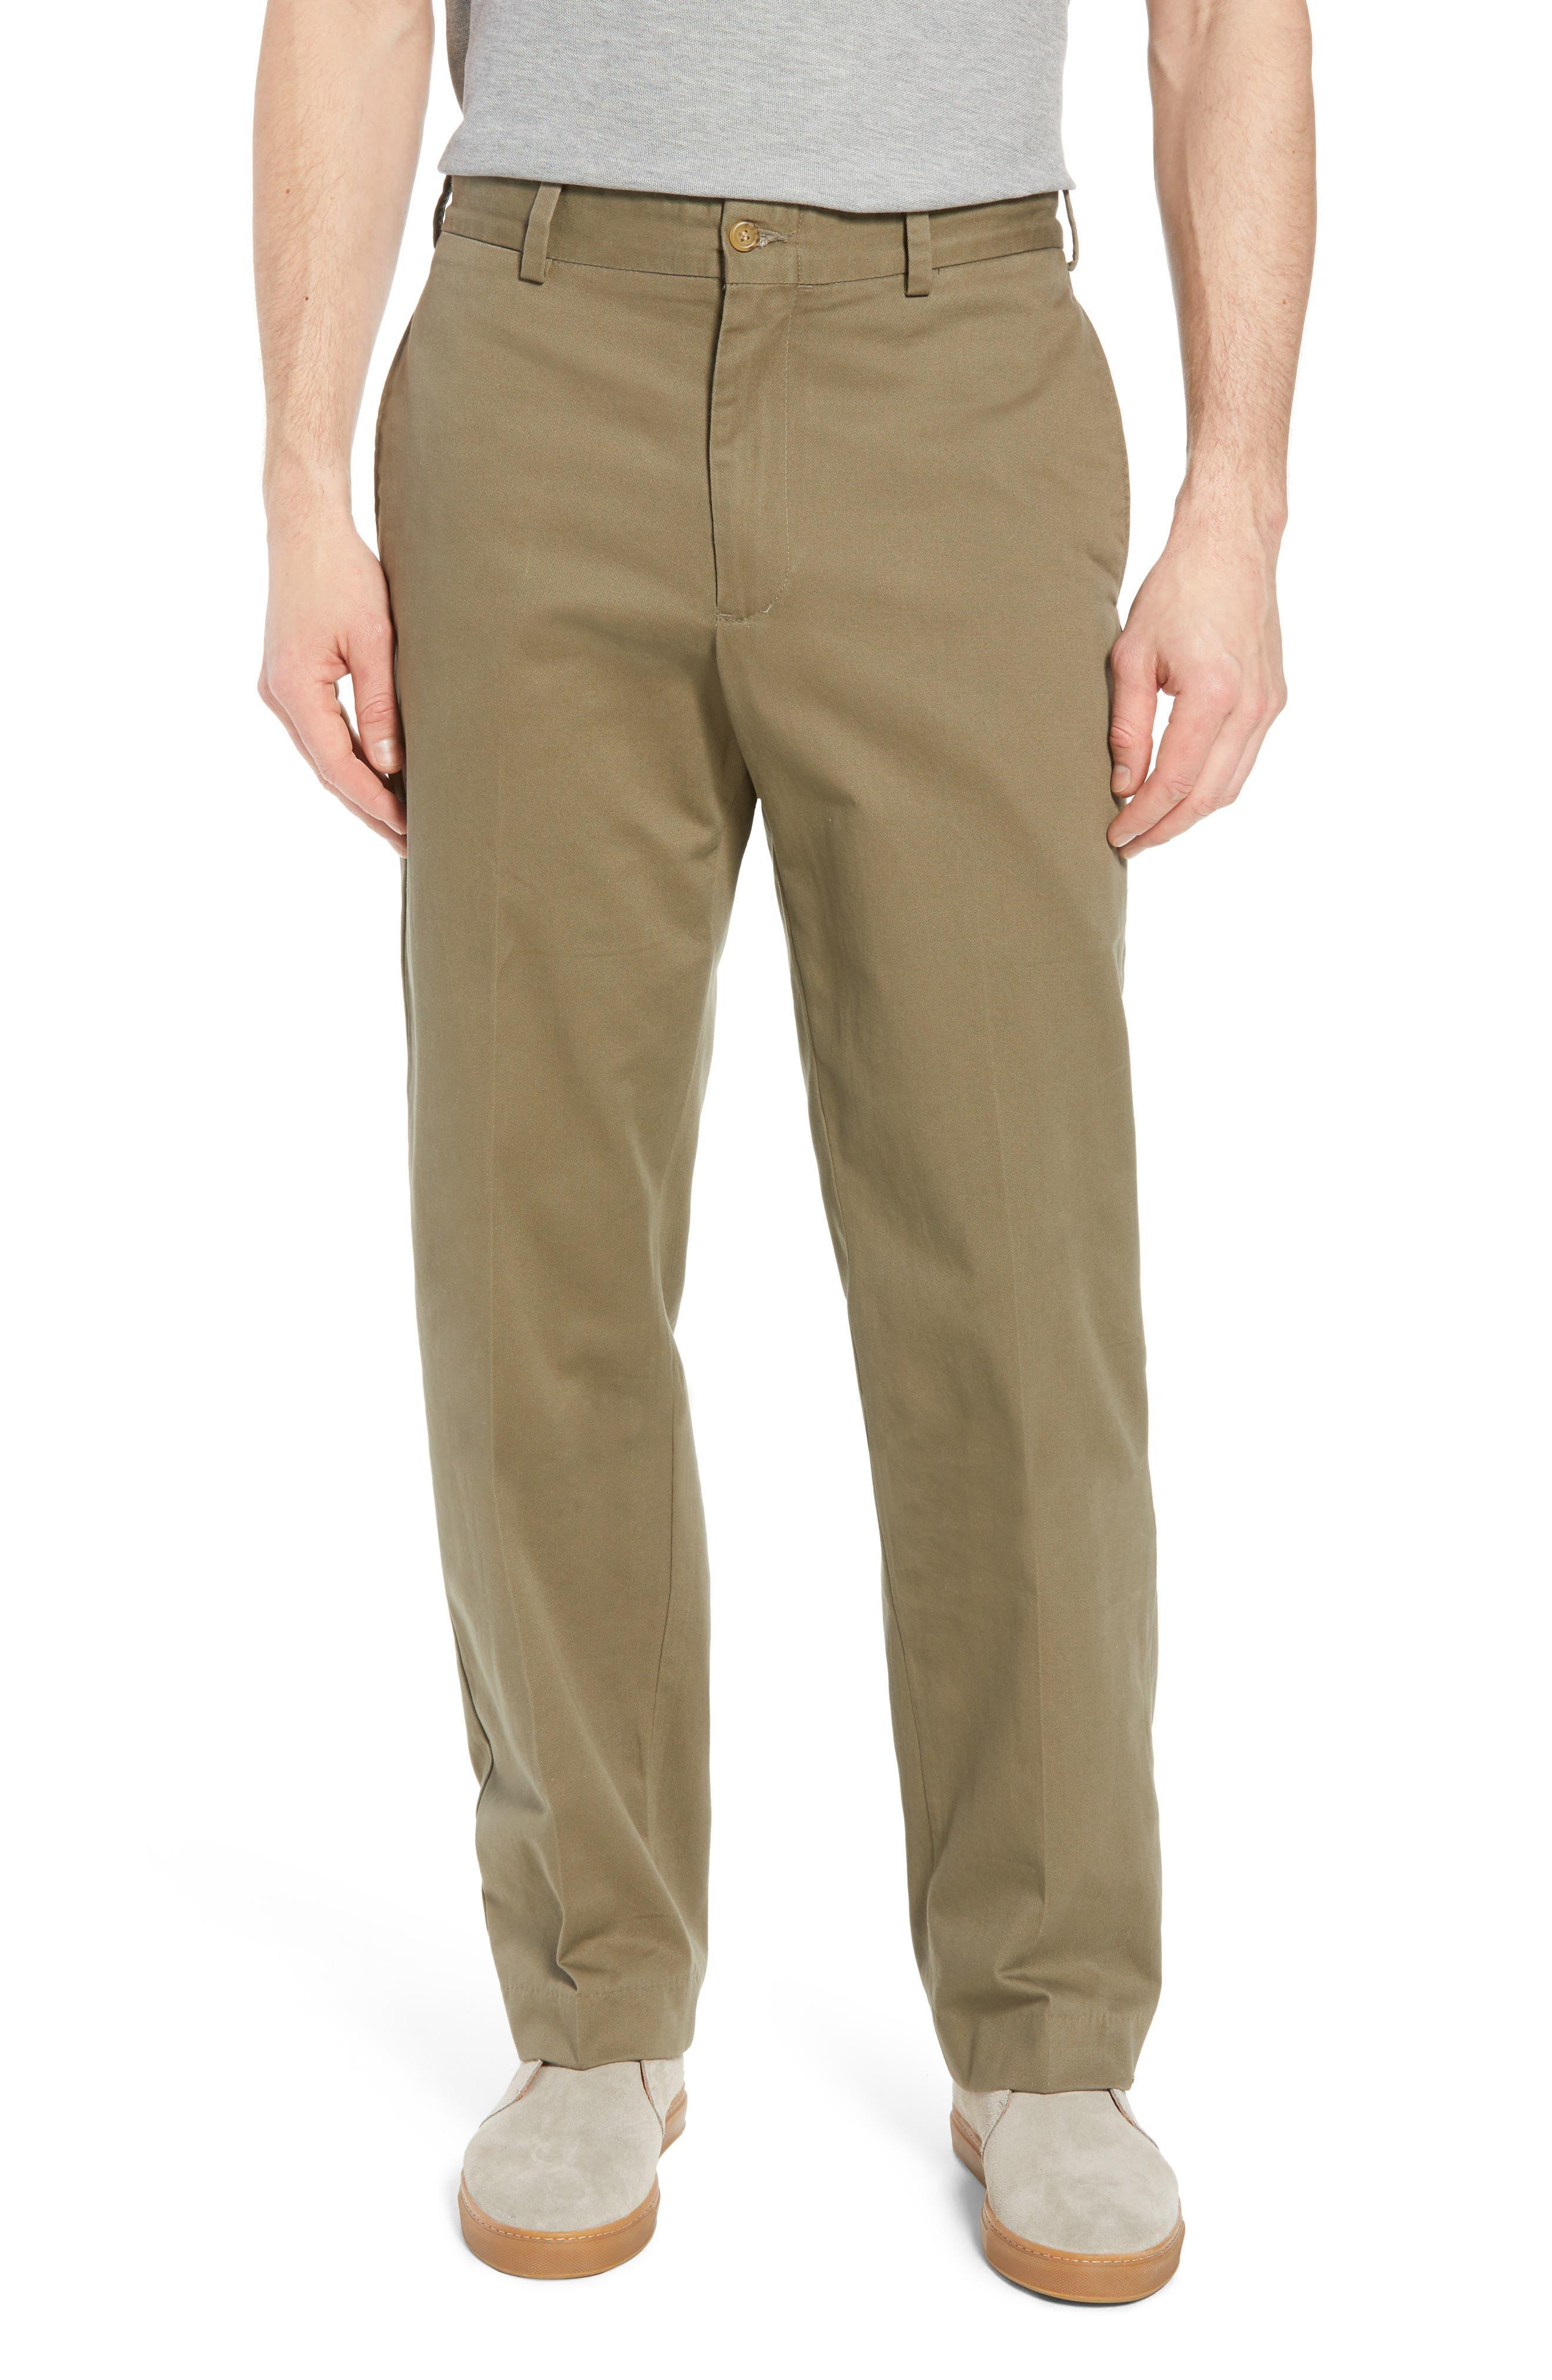 M2 Classic Fit Flat Front Vintage Twill Pants,                             Main thumbnail 1, color,                             330